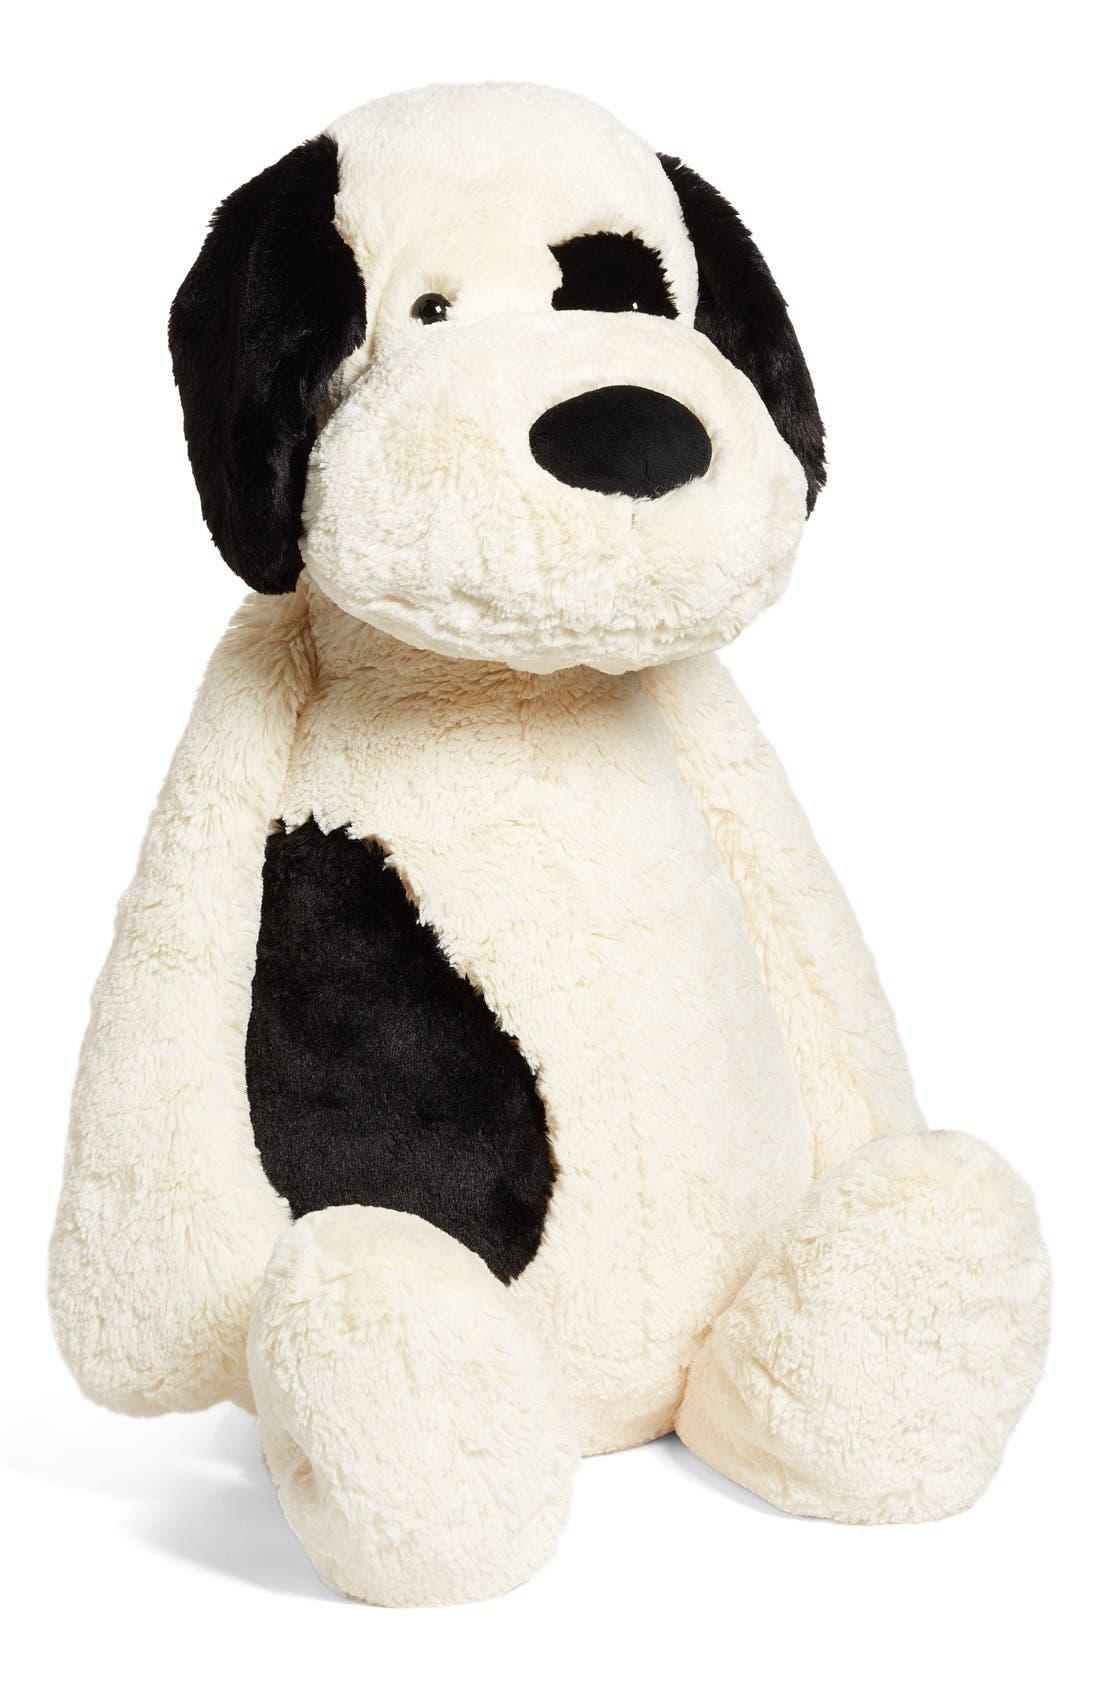 'Really Big Bashful Puppy' Stuffed Animal,                             Main thumbnail 1, color,                             IVORY/ BLACK